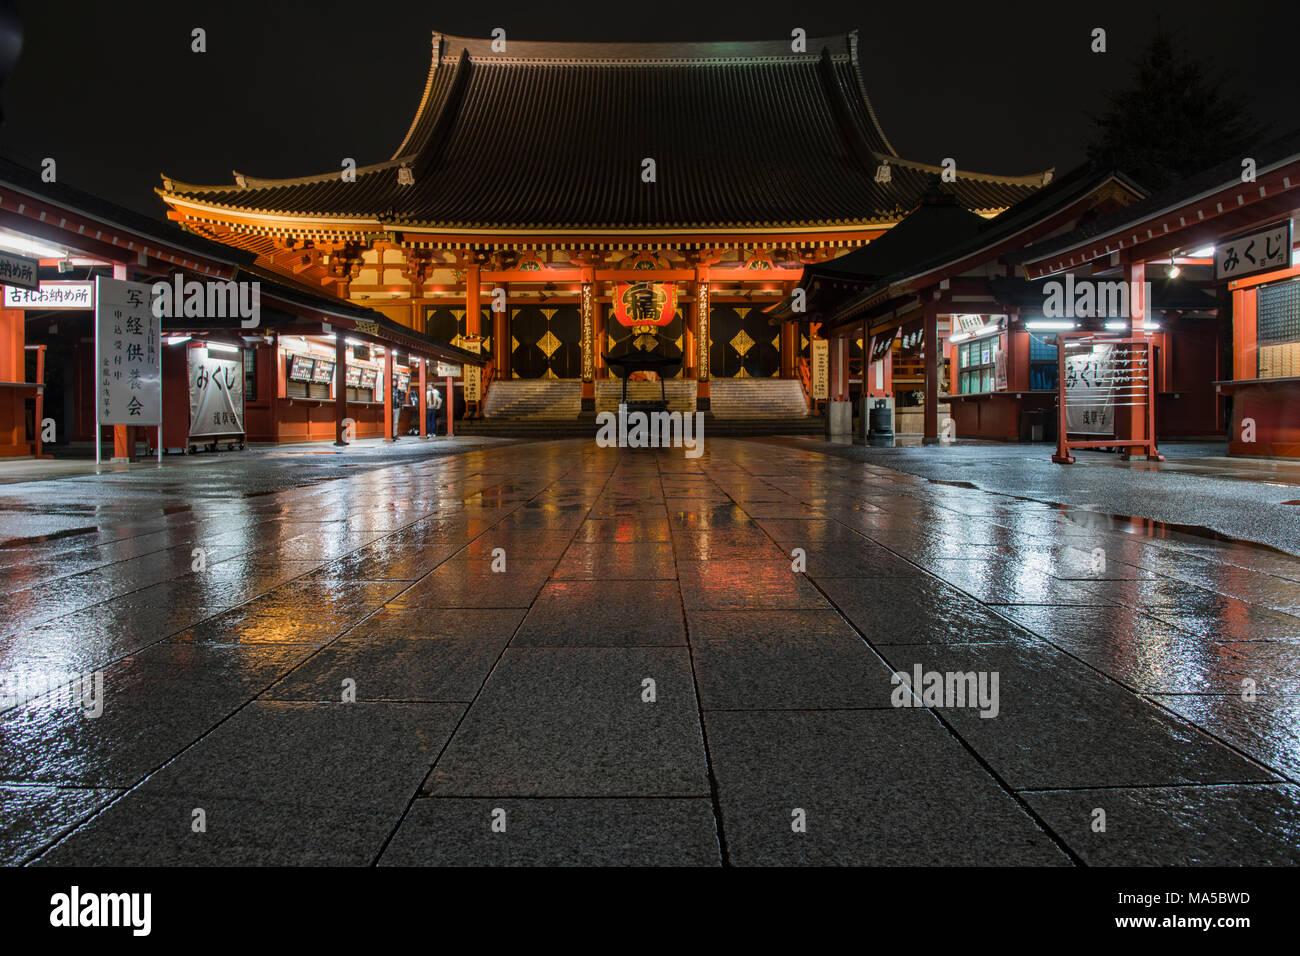 Asien, Japan, Nihon, Nippon, Tokio, Taito, Asakusa, Sens?-ji Tempel bei Nacht Stockbild